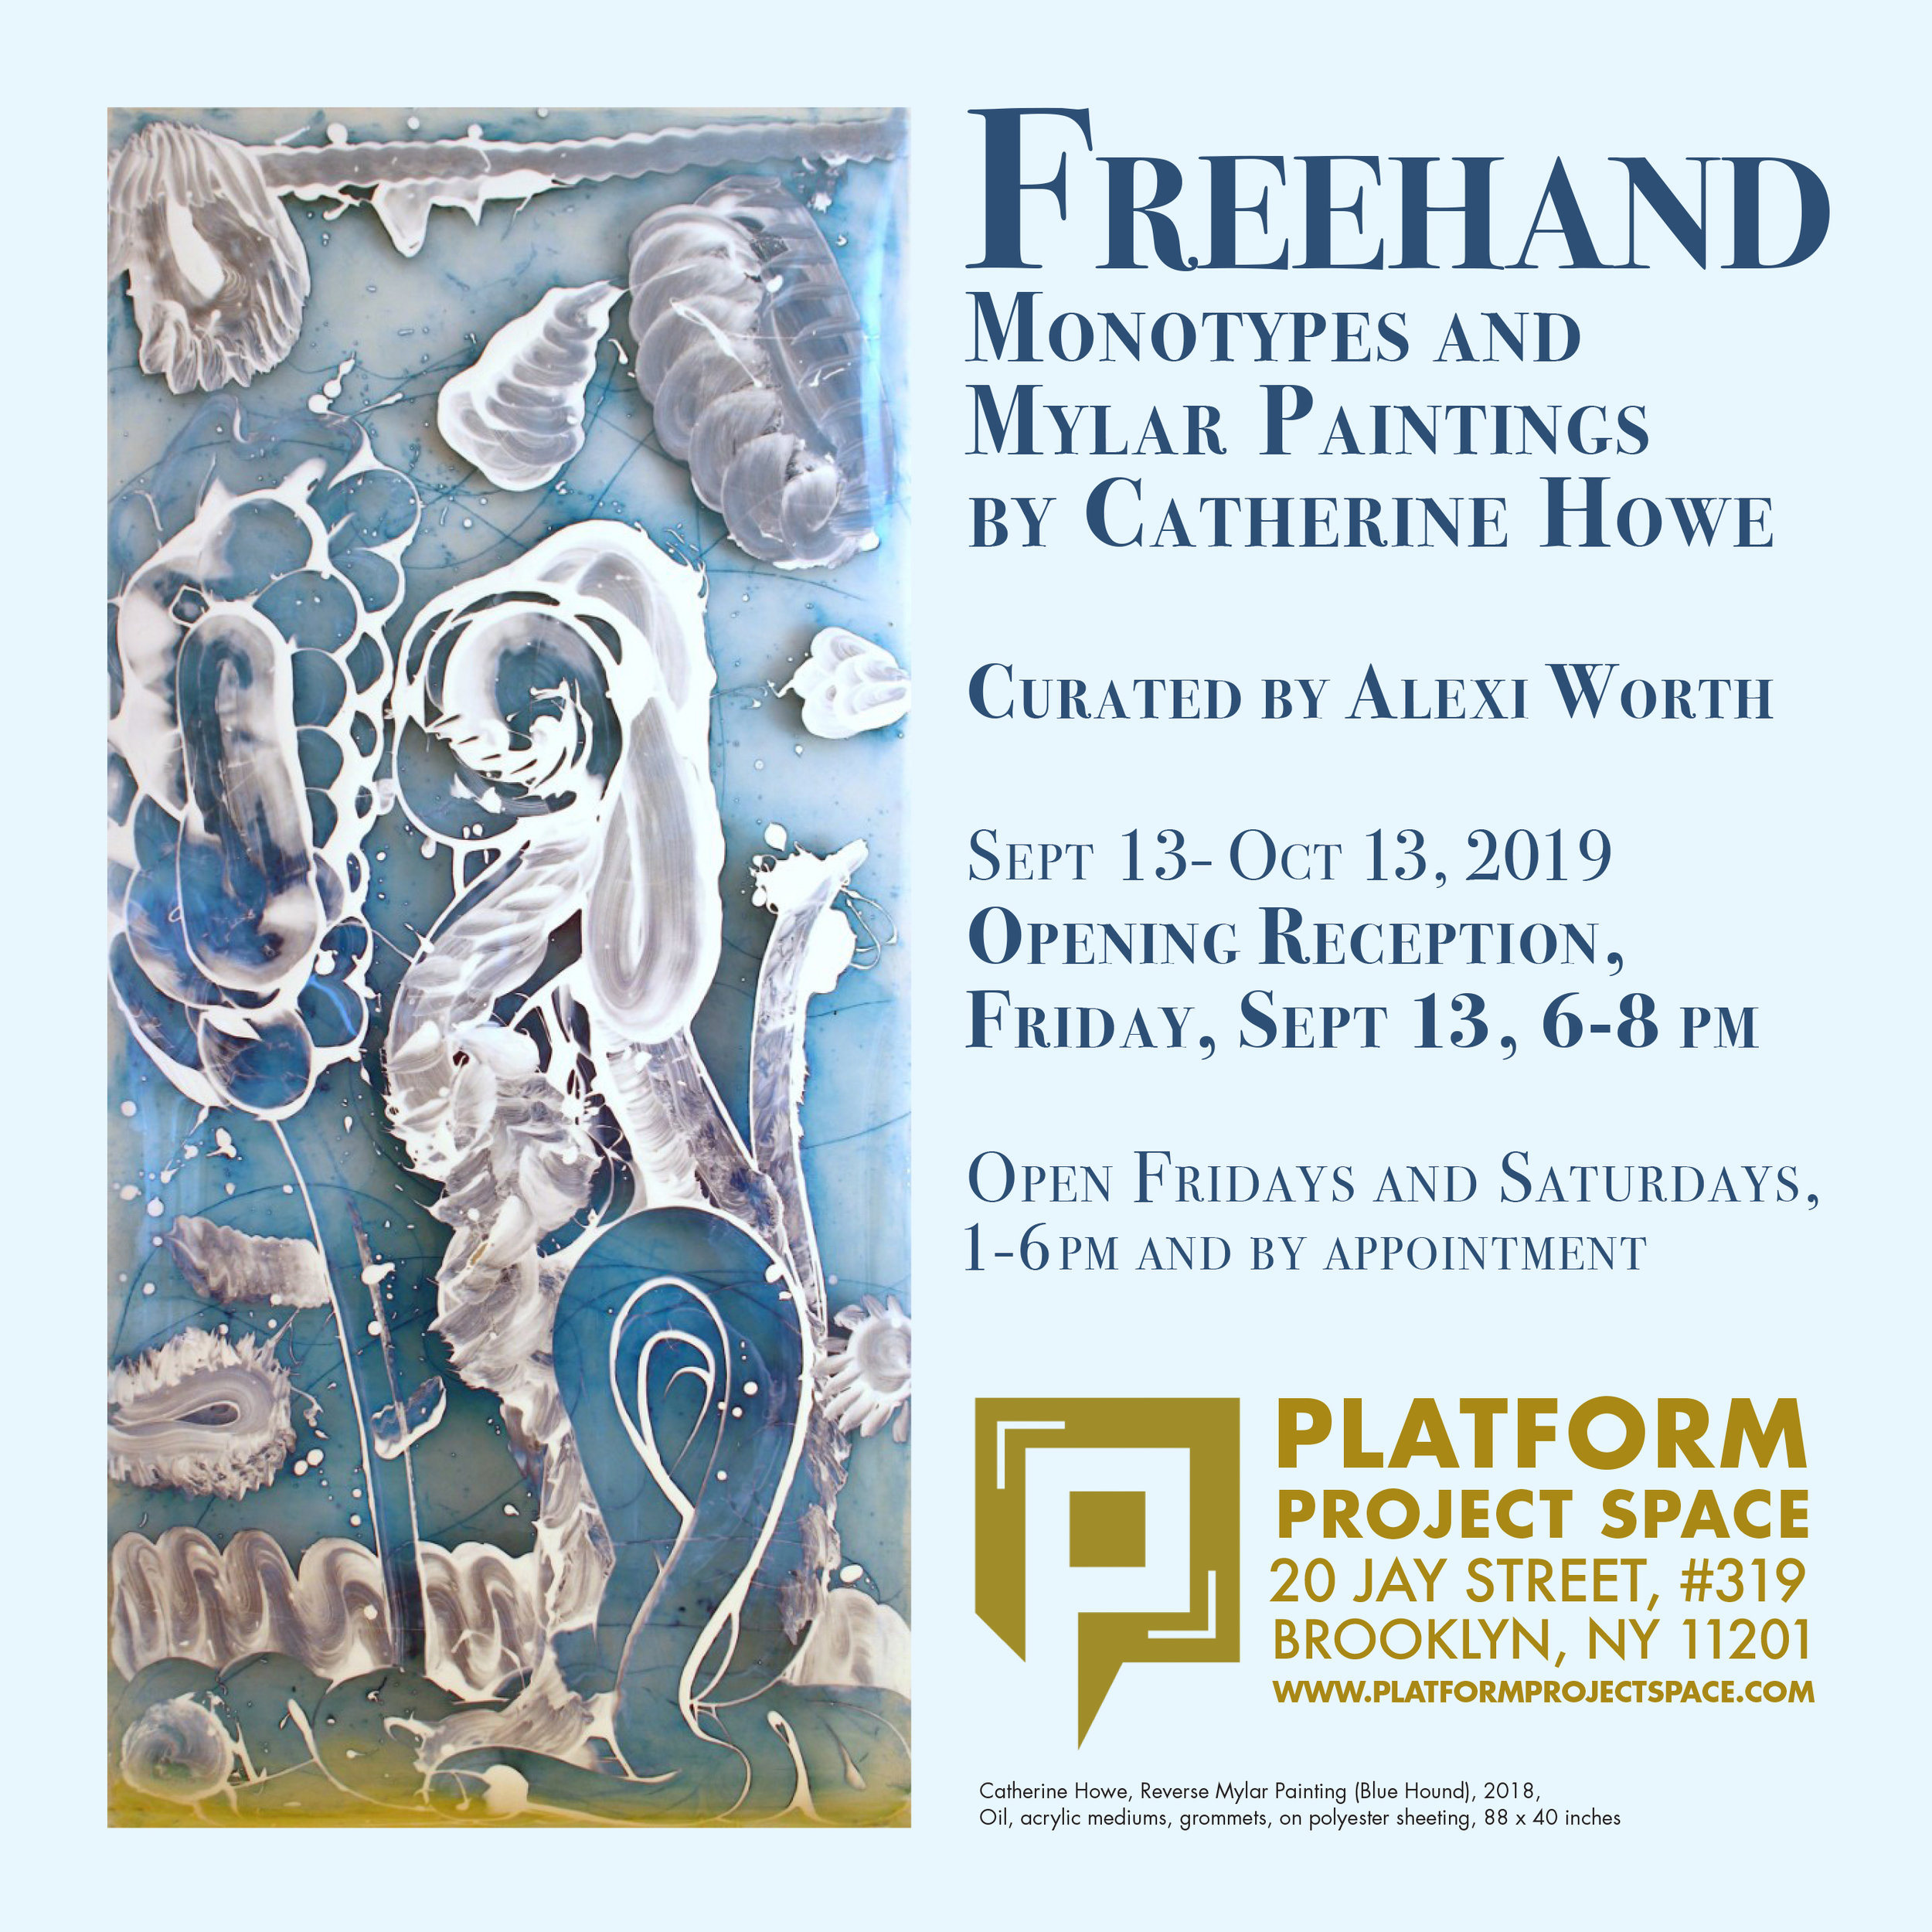 freehand_platform.jpg